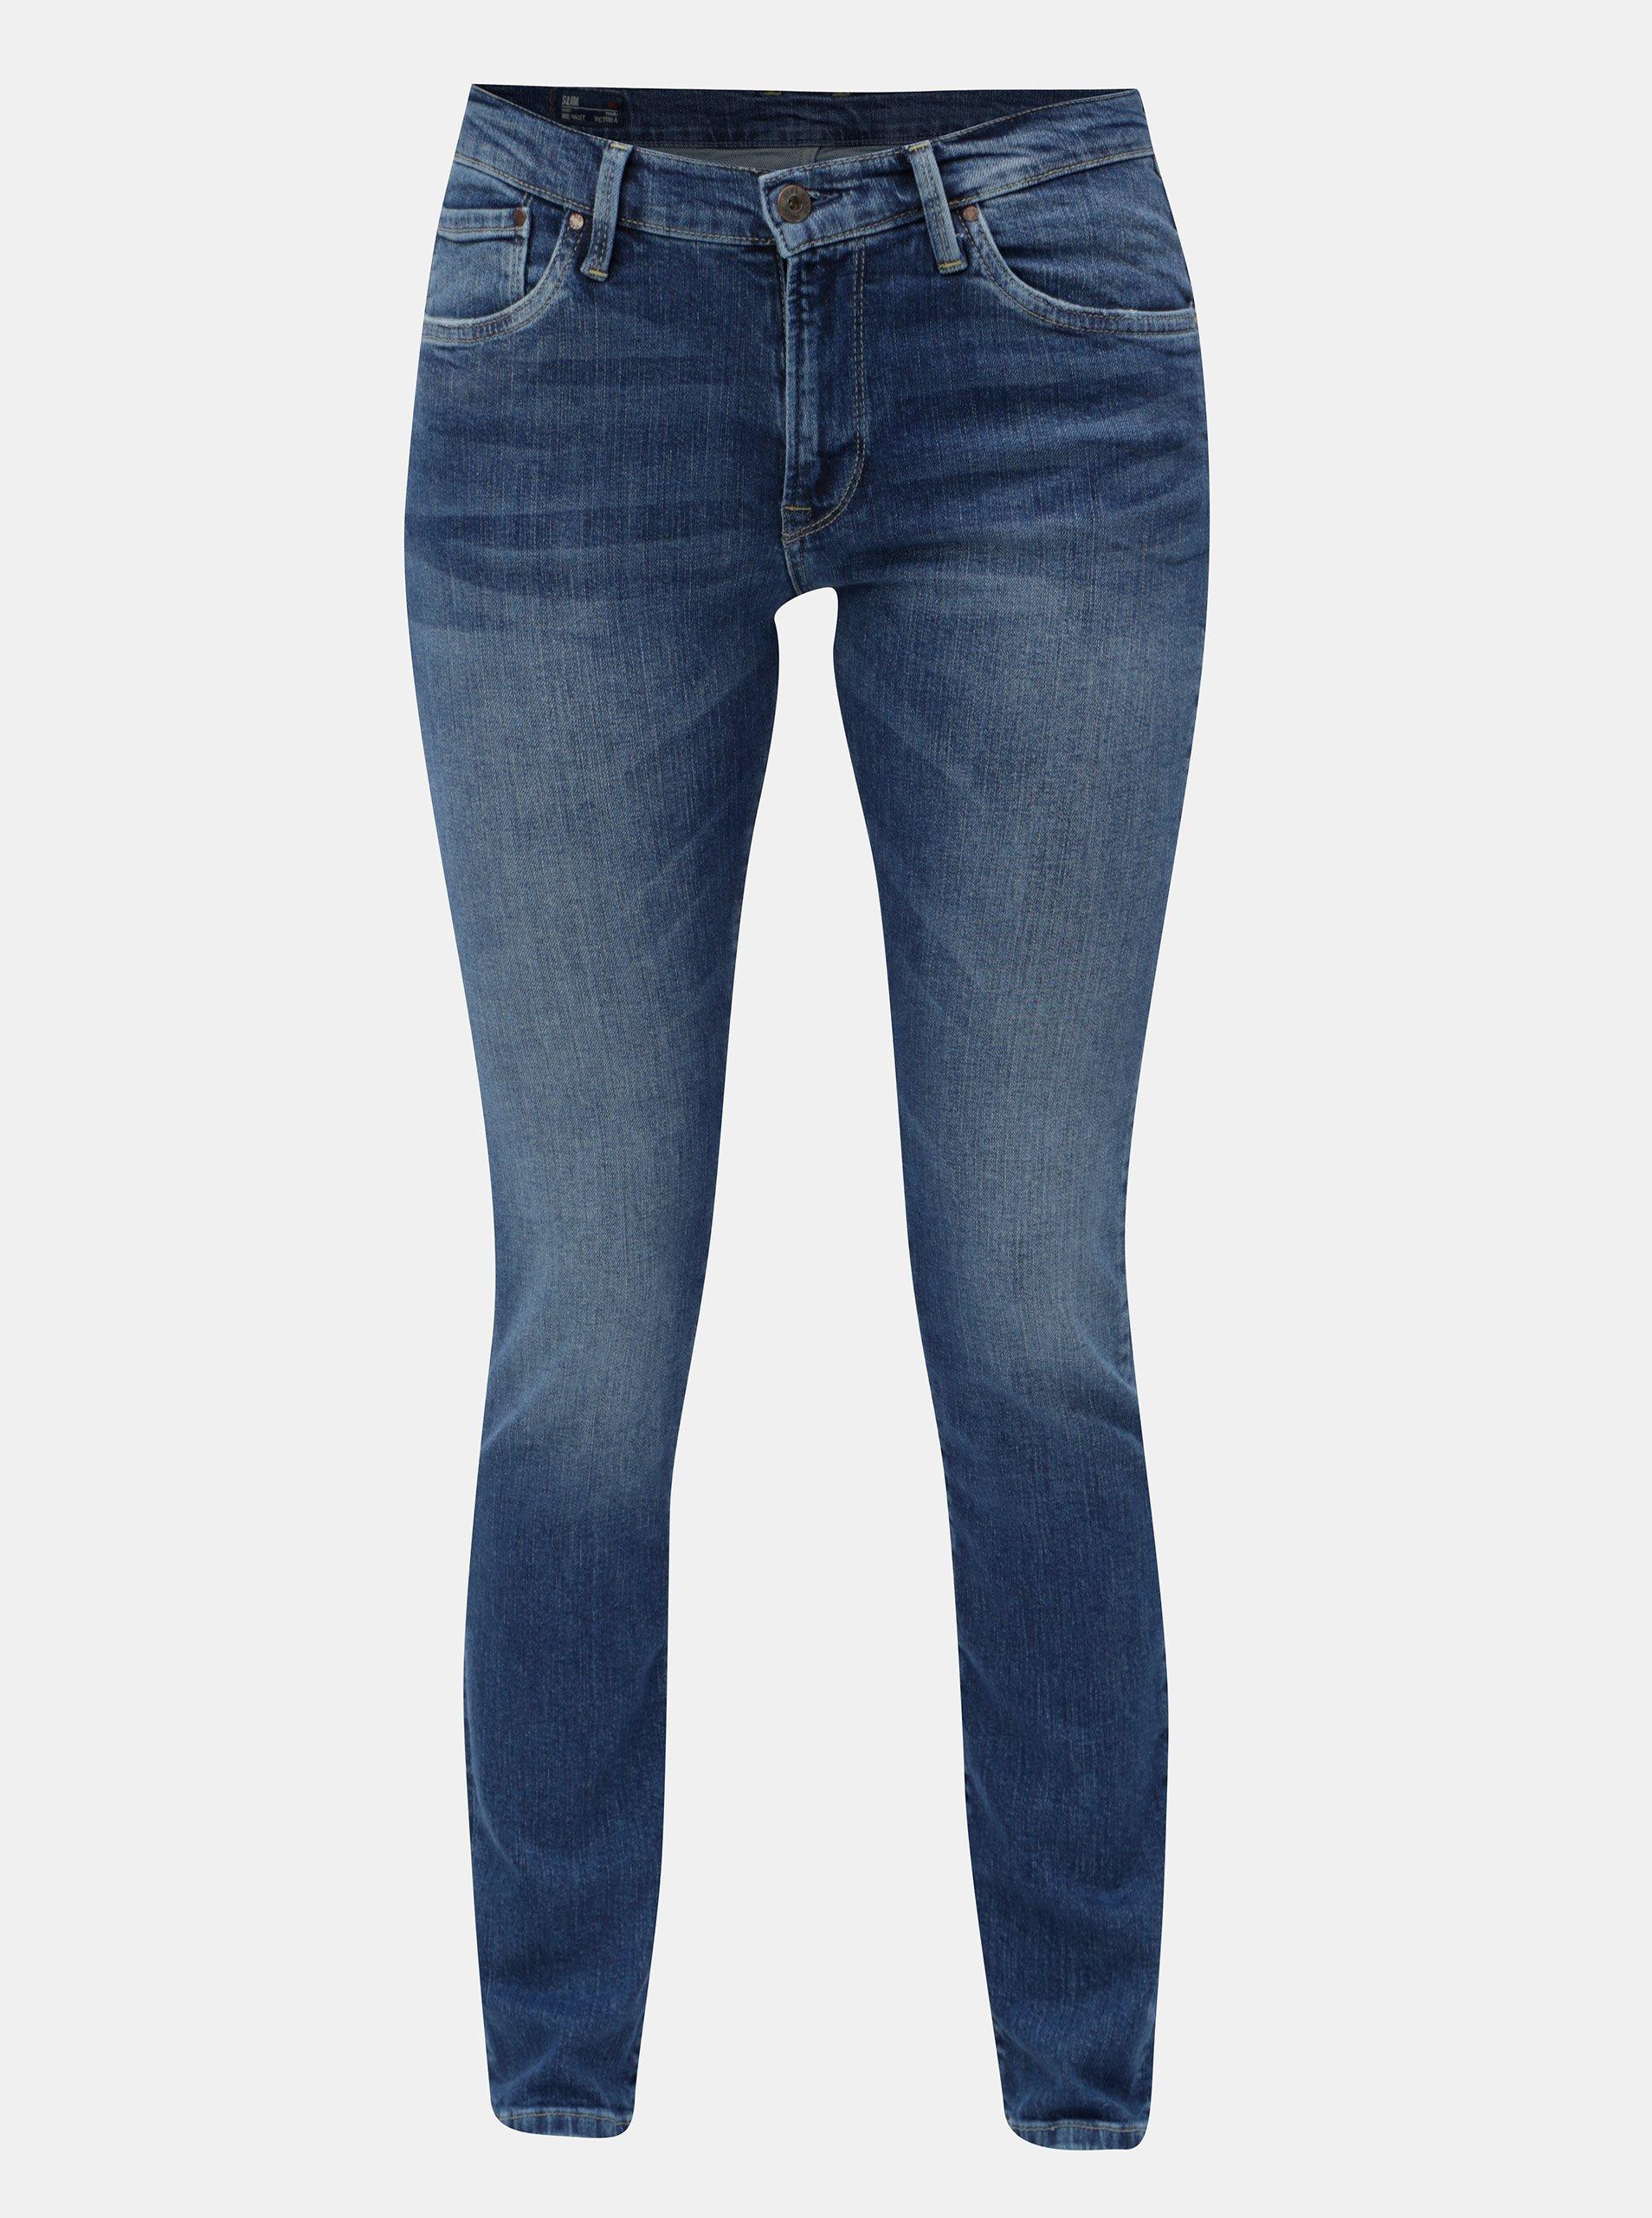 Modré dámské slim džíny Pepe Jeans Victoria 441bbb29d5